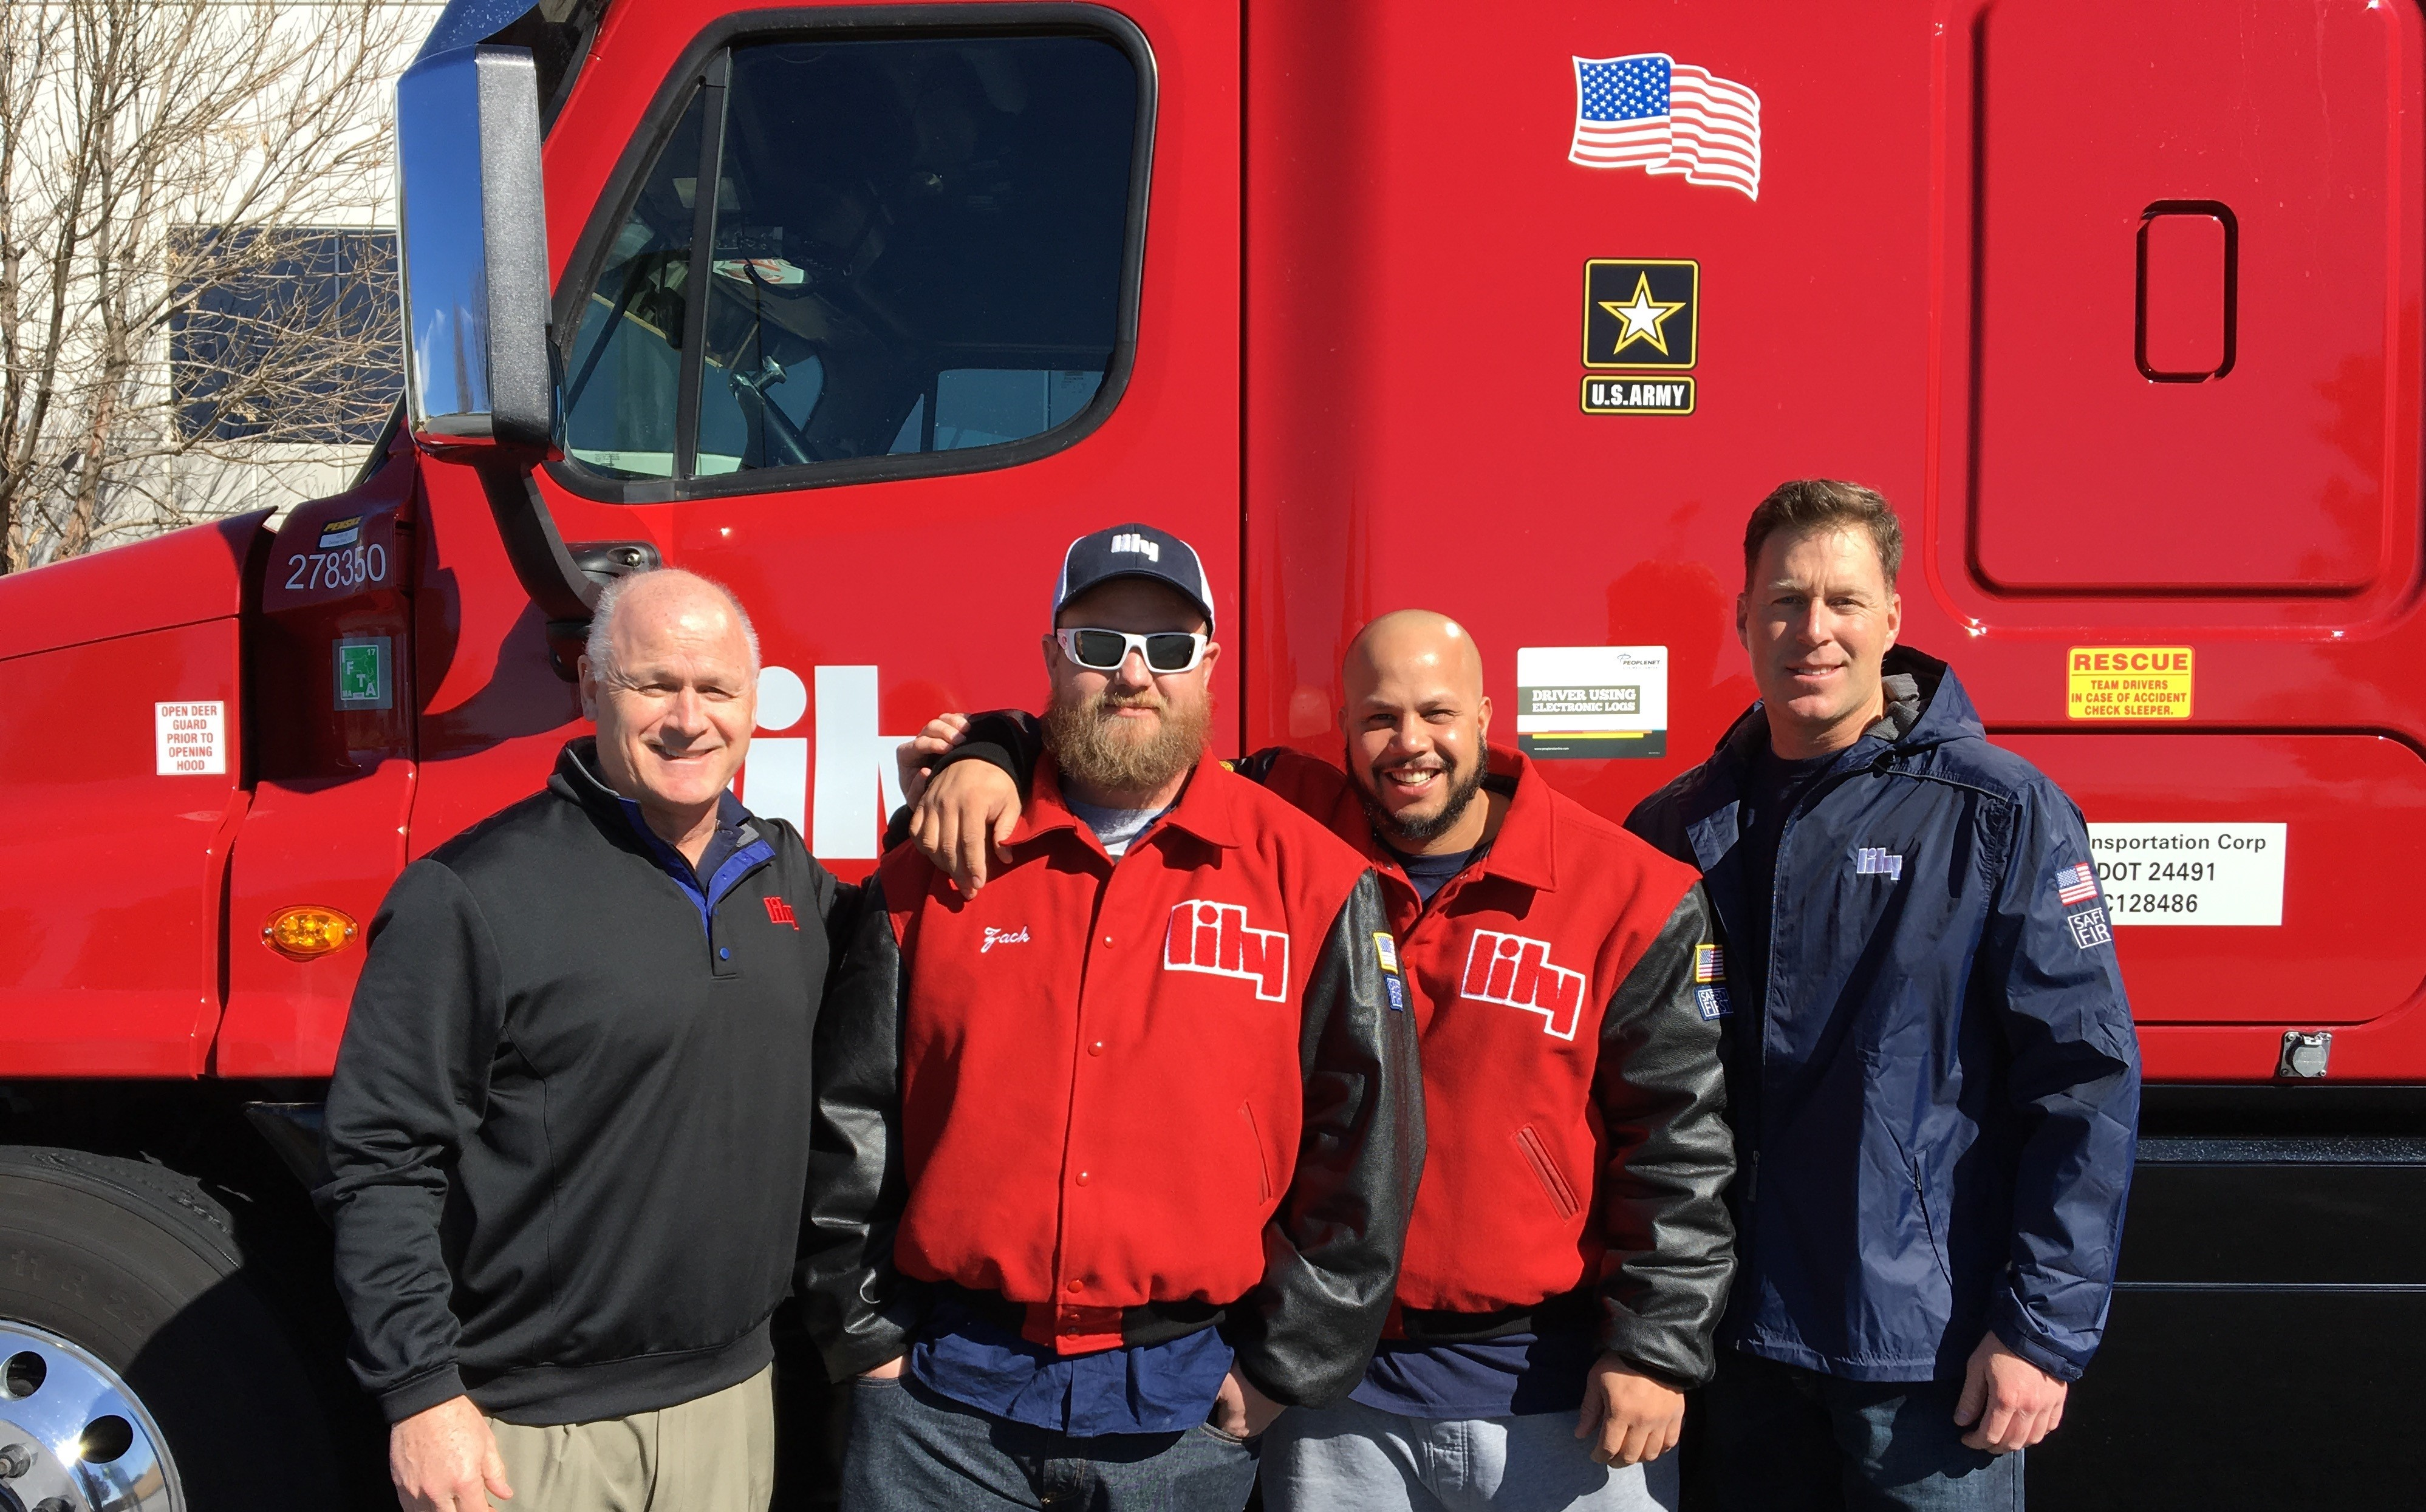 OTR Team standing in front of truck